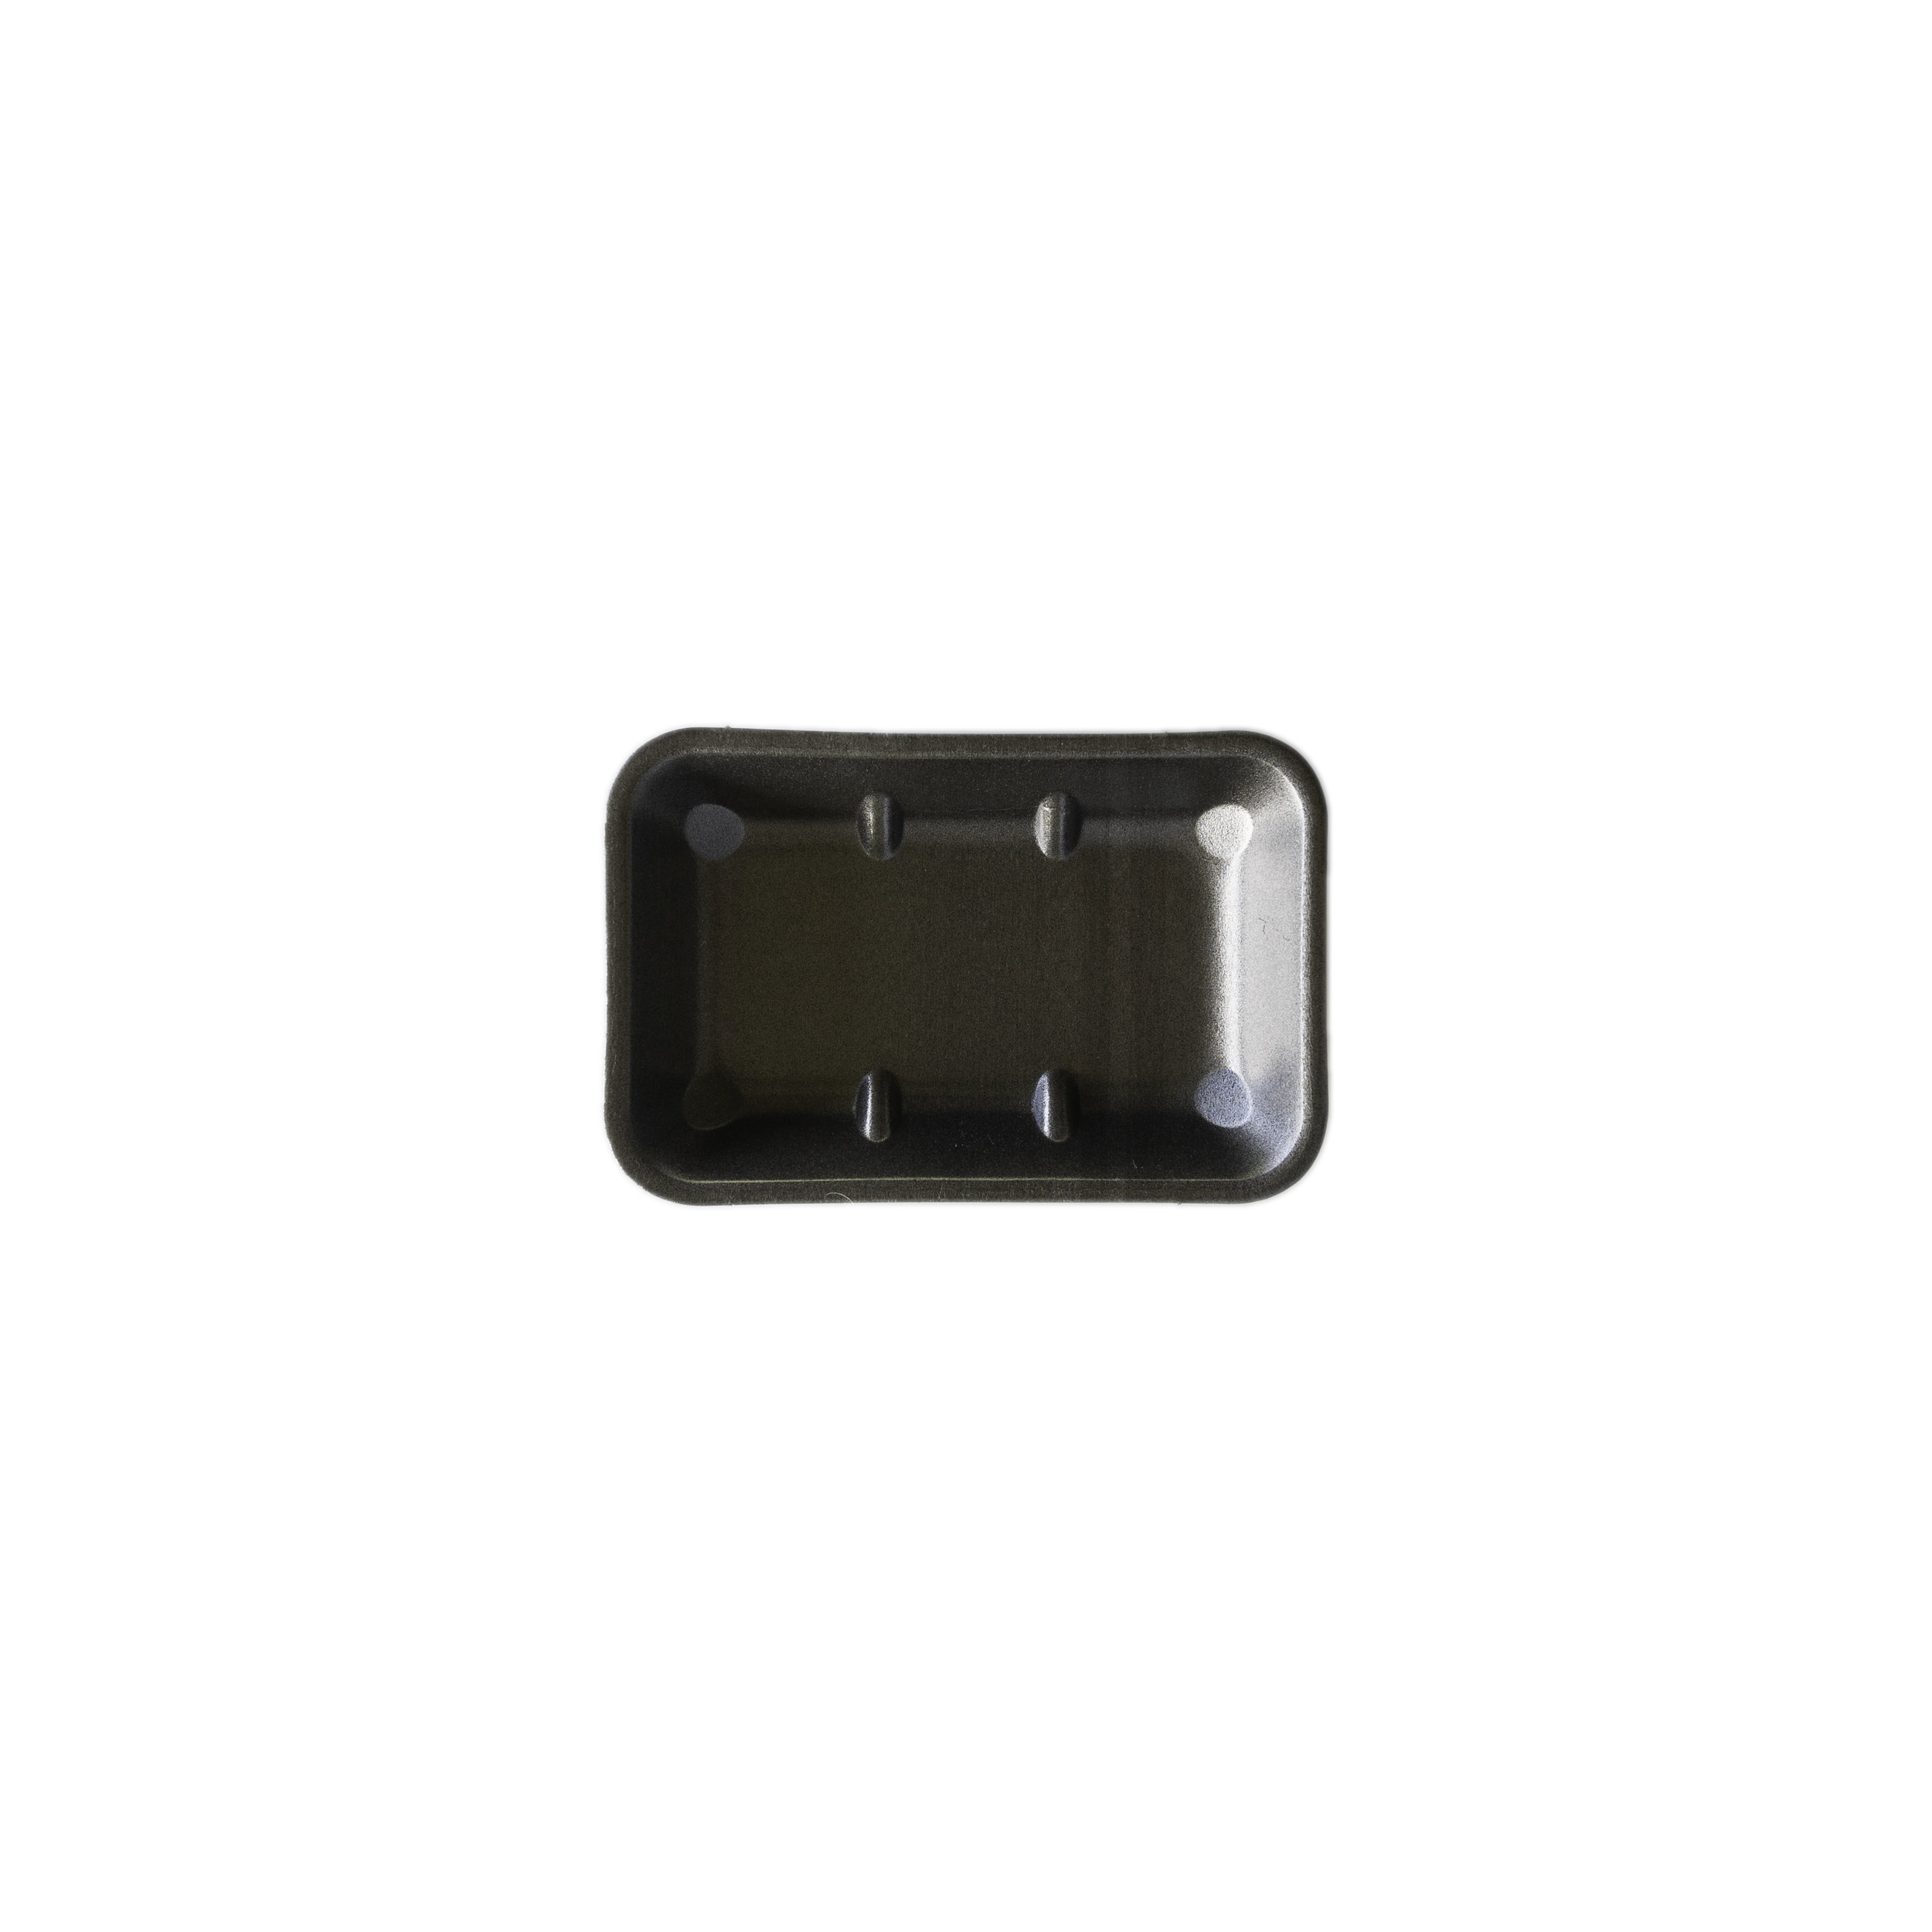 iK0219 CLOSED CELL D  EEP 8x5   90 per sleeve 360 per carton